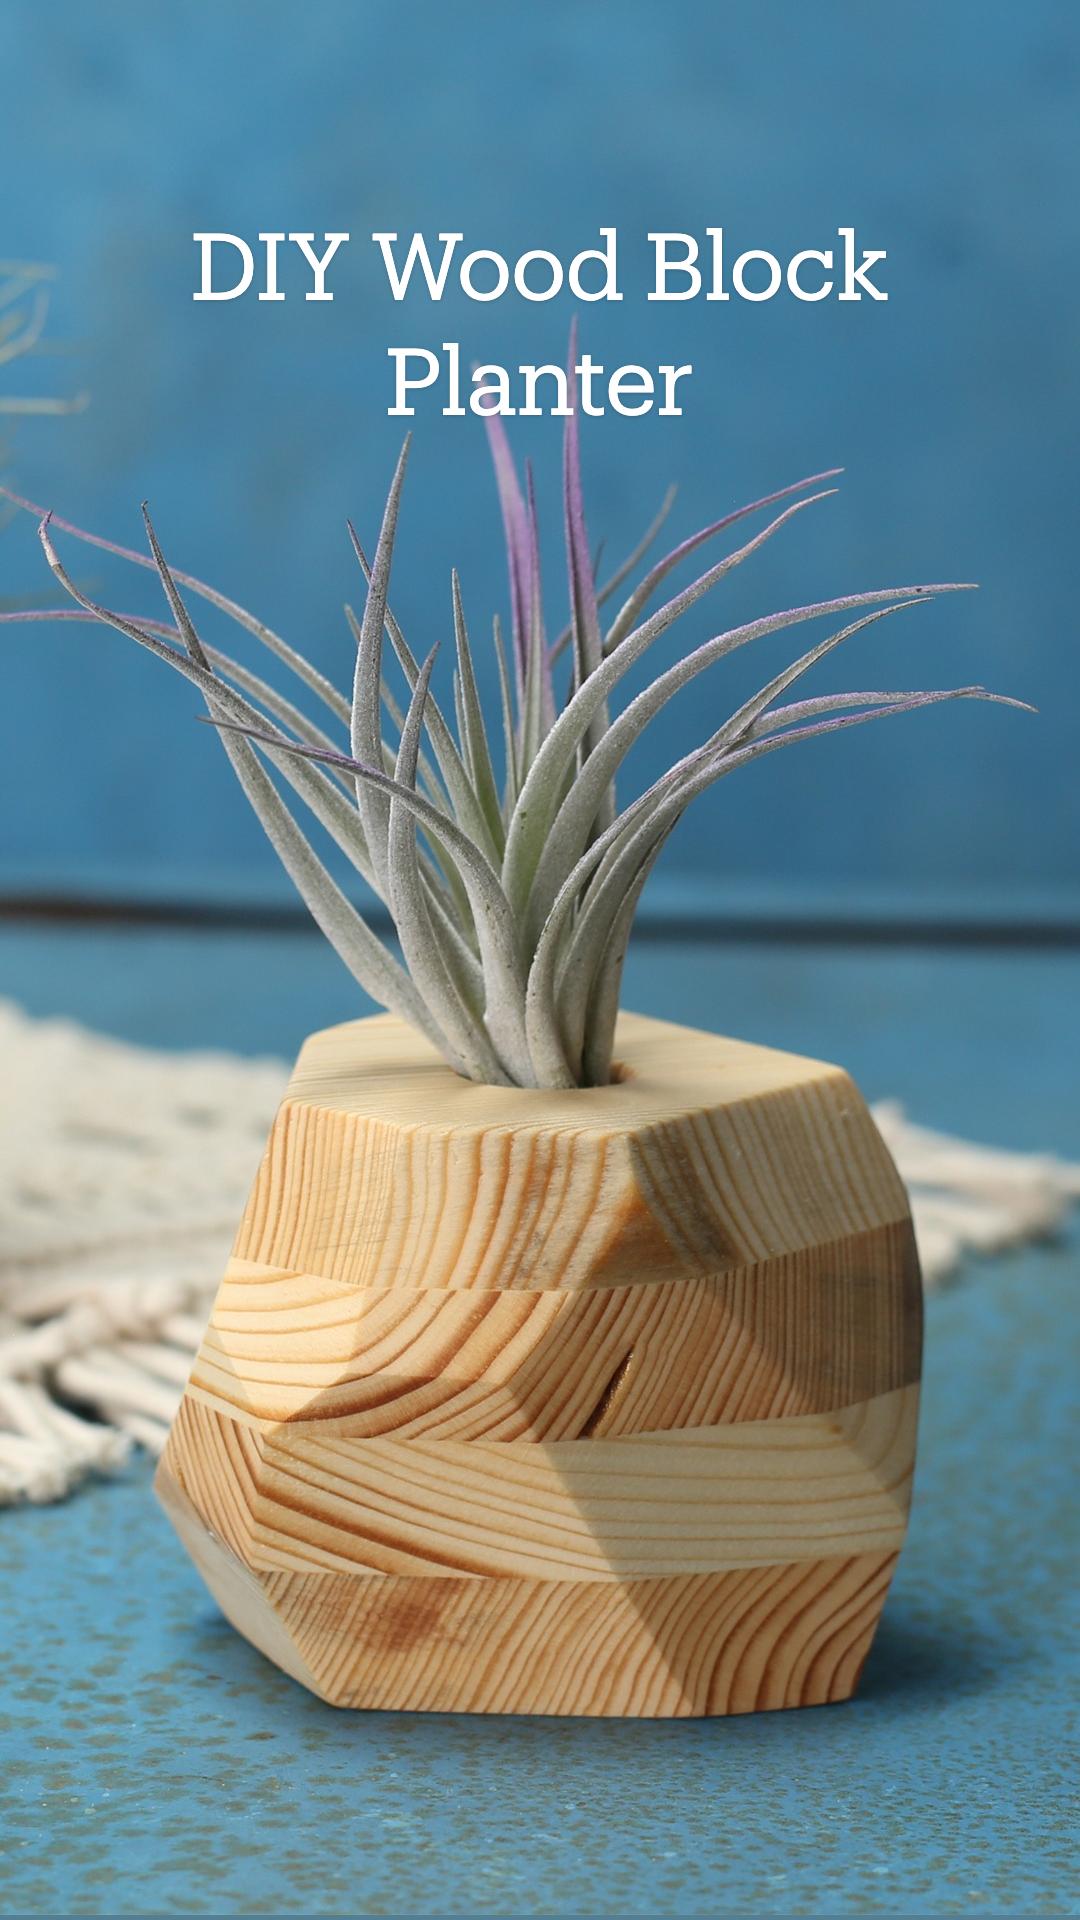 DIY Wood Block Planter